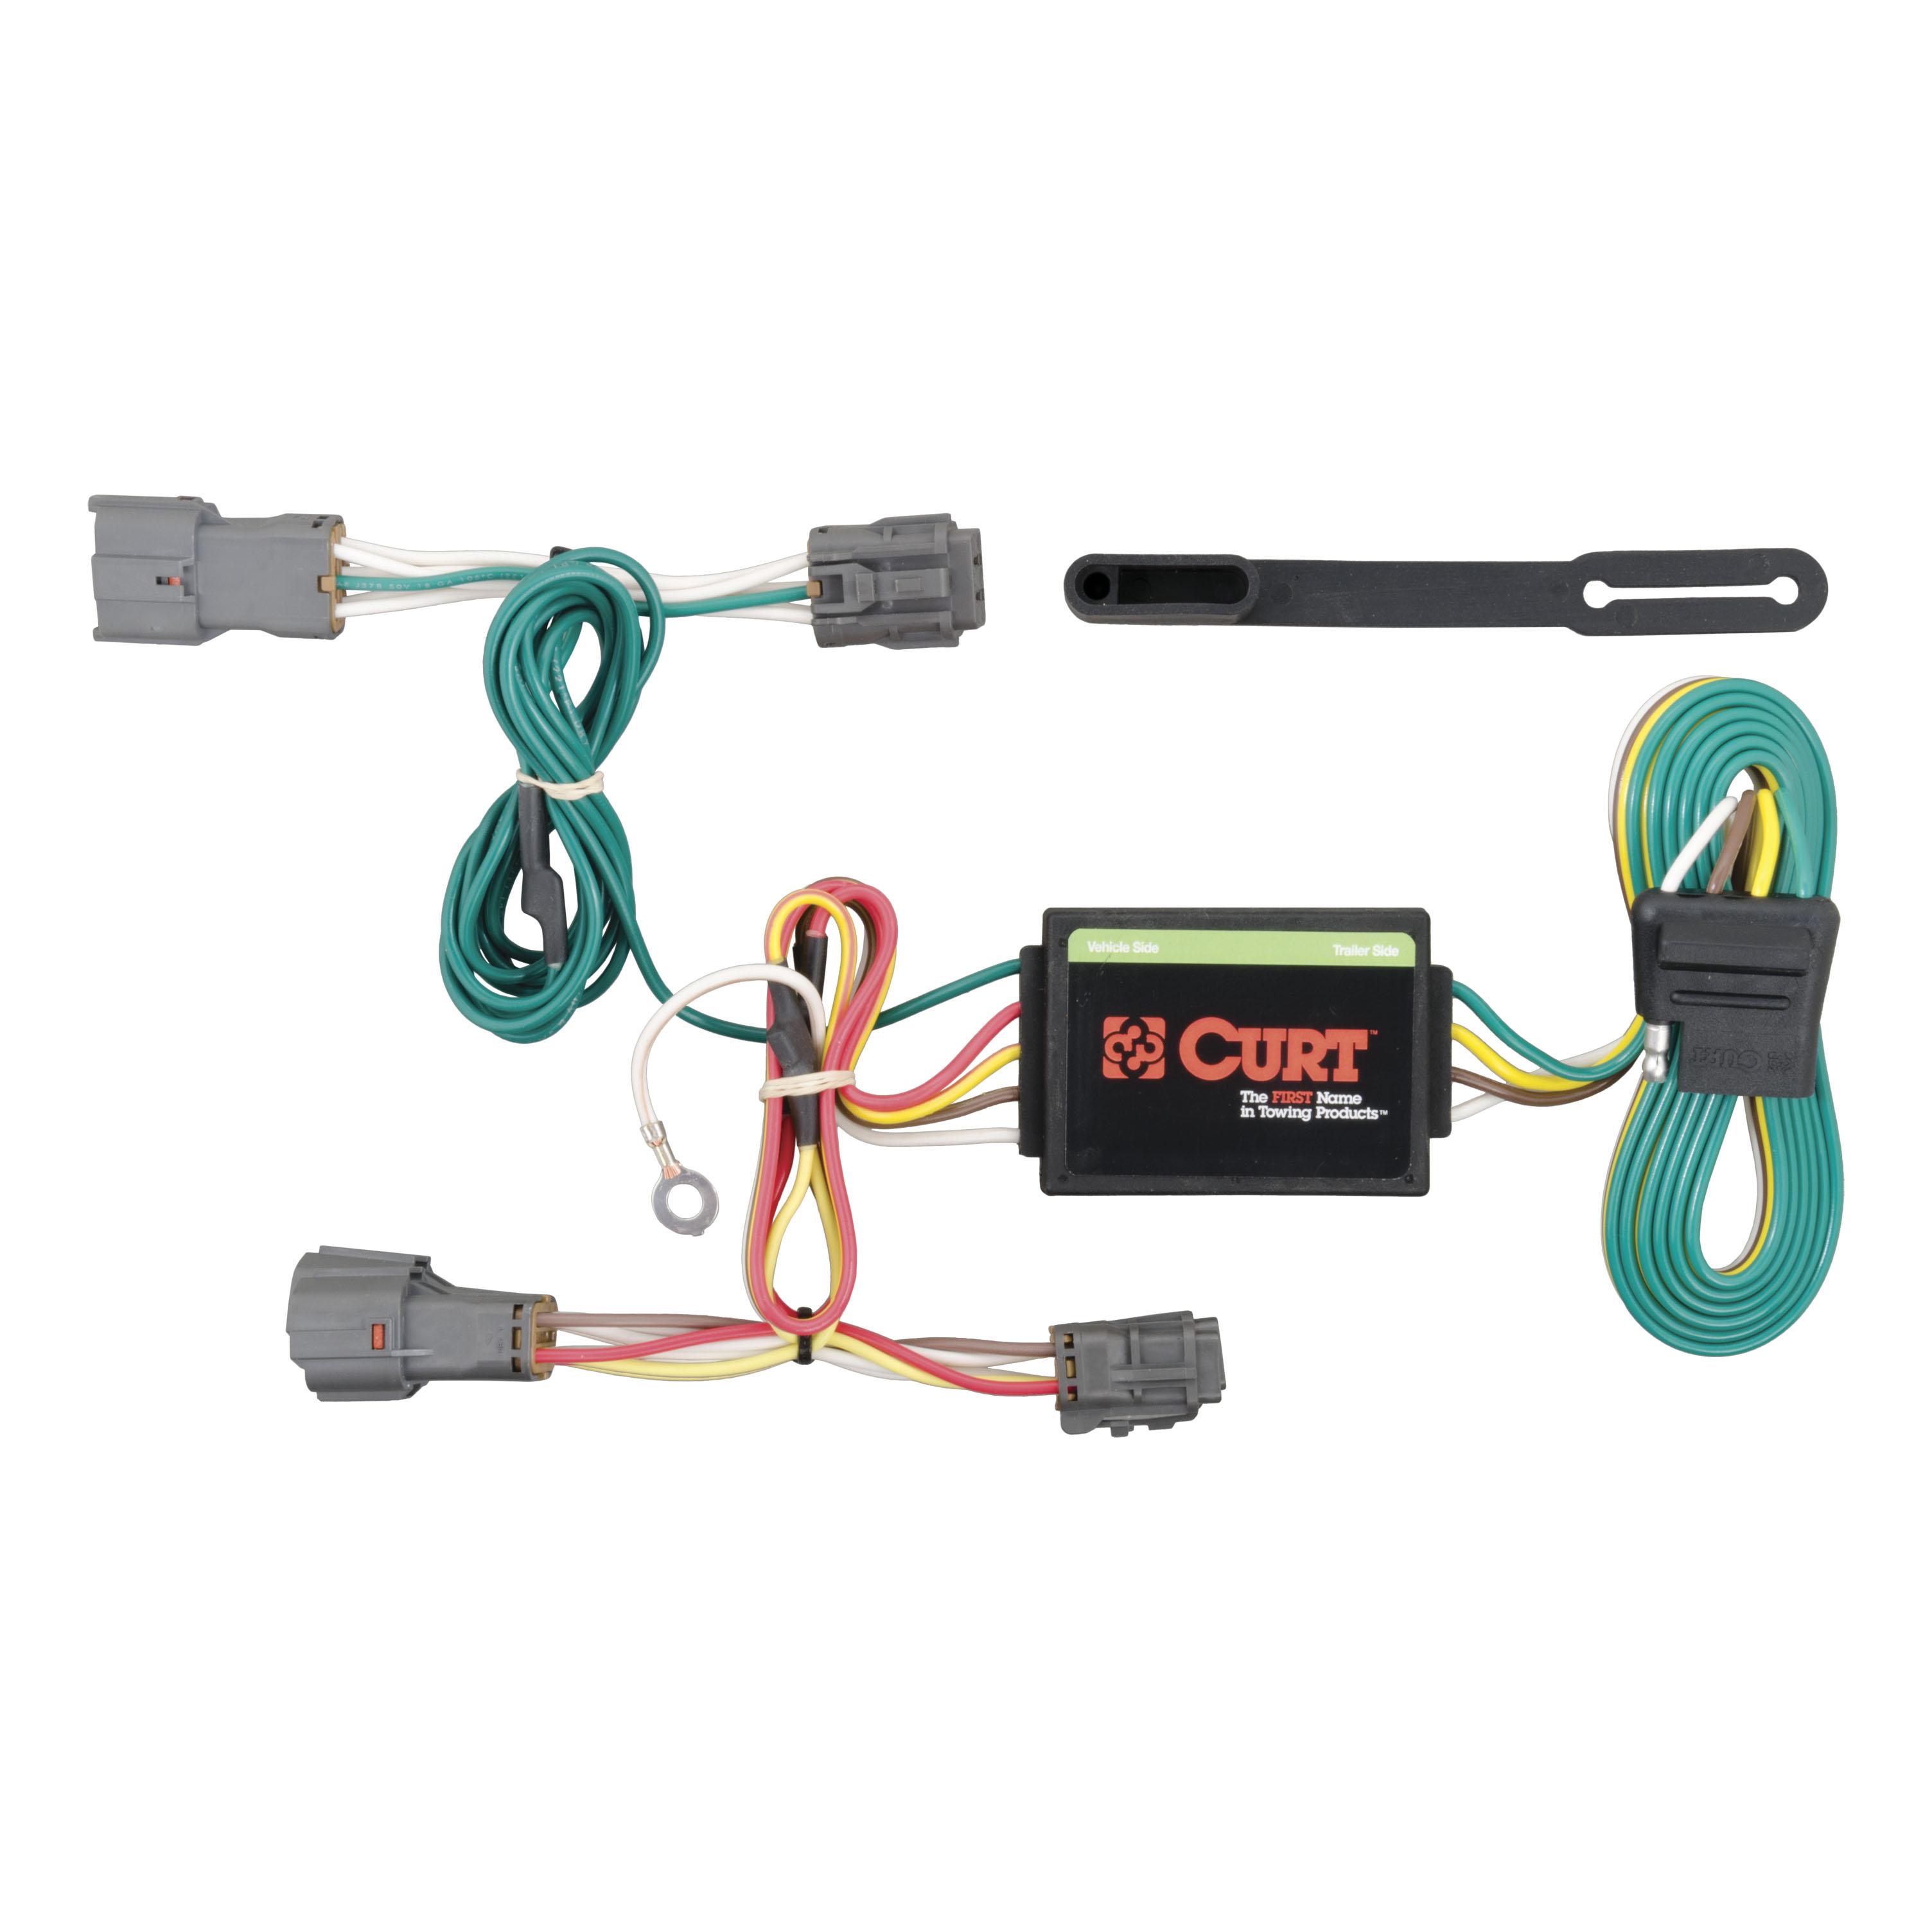 curt vehicle to trailer wiring harness 56222 for kia rondo, soul ebay harley-davidson trailer wiring harness curt vehicle to trailer wiring harness 56222 for kia rondo, soul